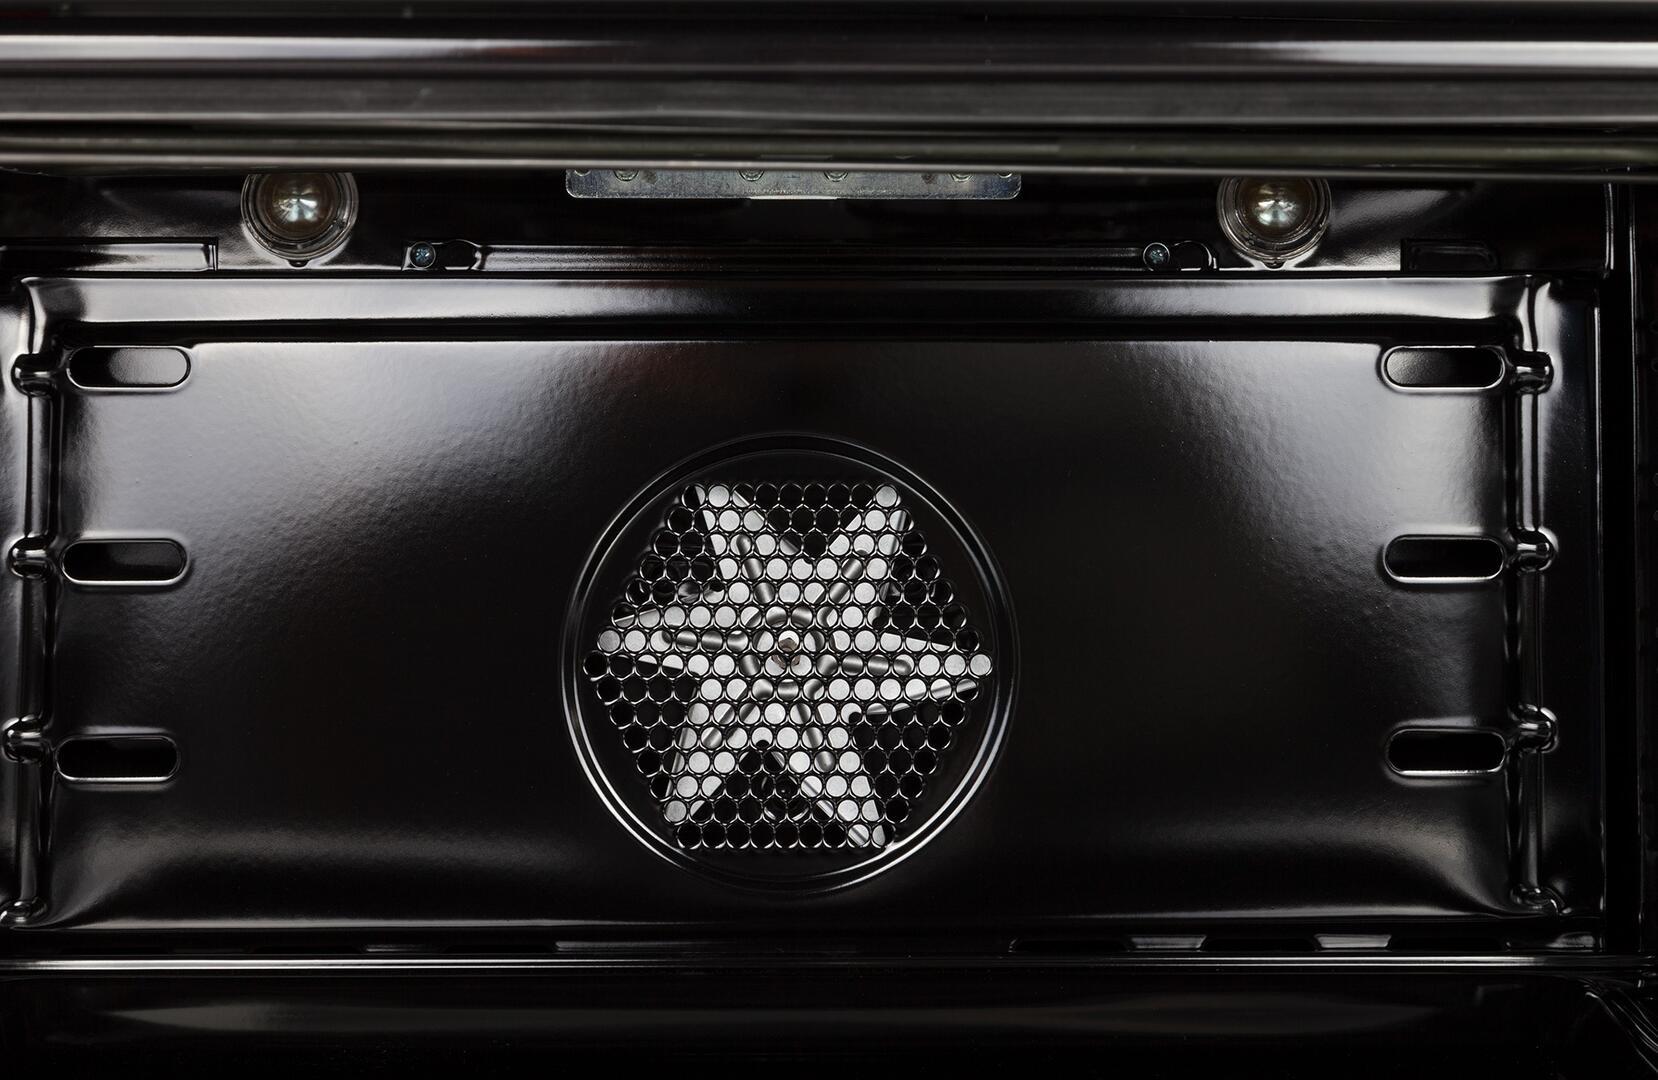 Ilve Professional Plus UPW90FDMPM Freestanding Dual Fuel Range Graphite, 6